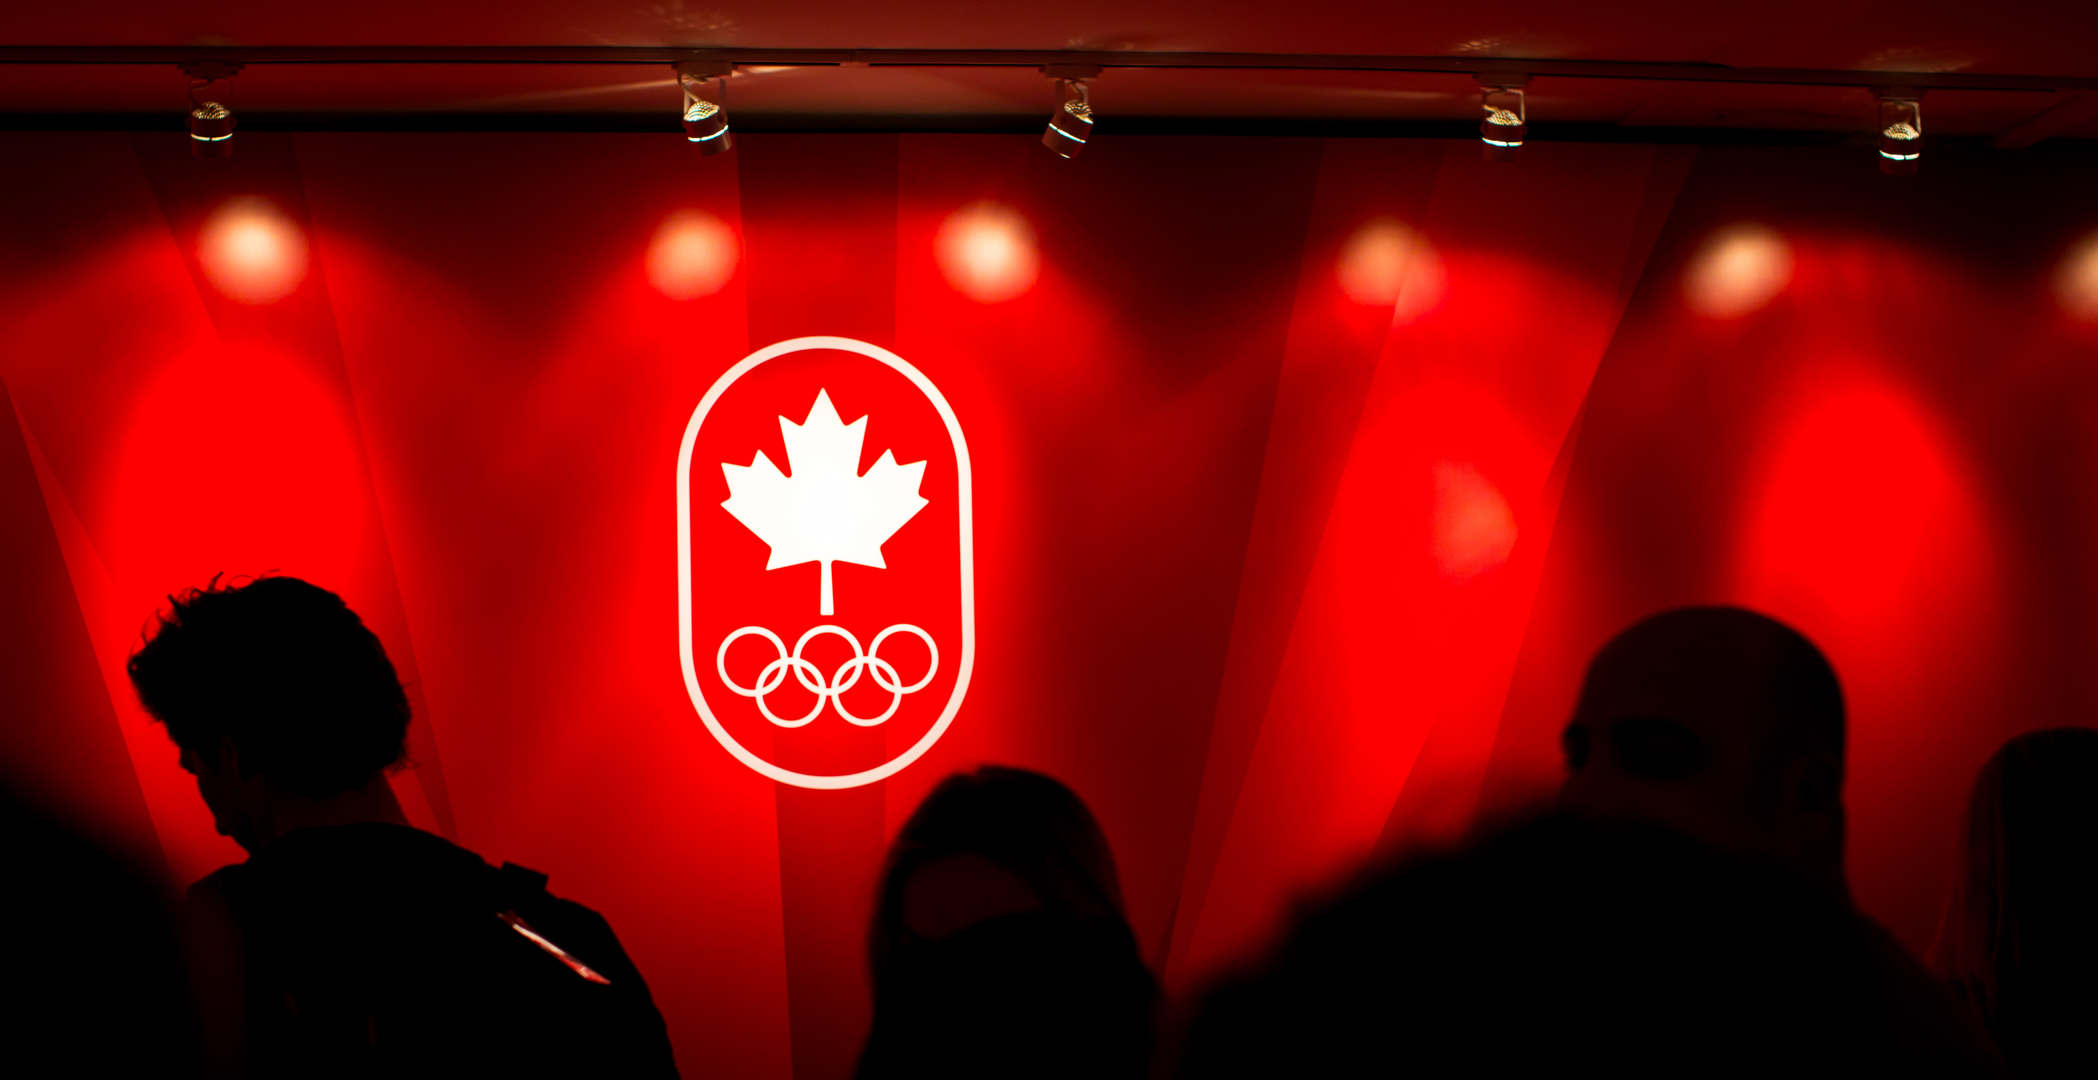 Canada Theme Day 0 - VanderBeek.jpg